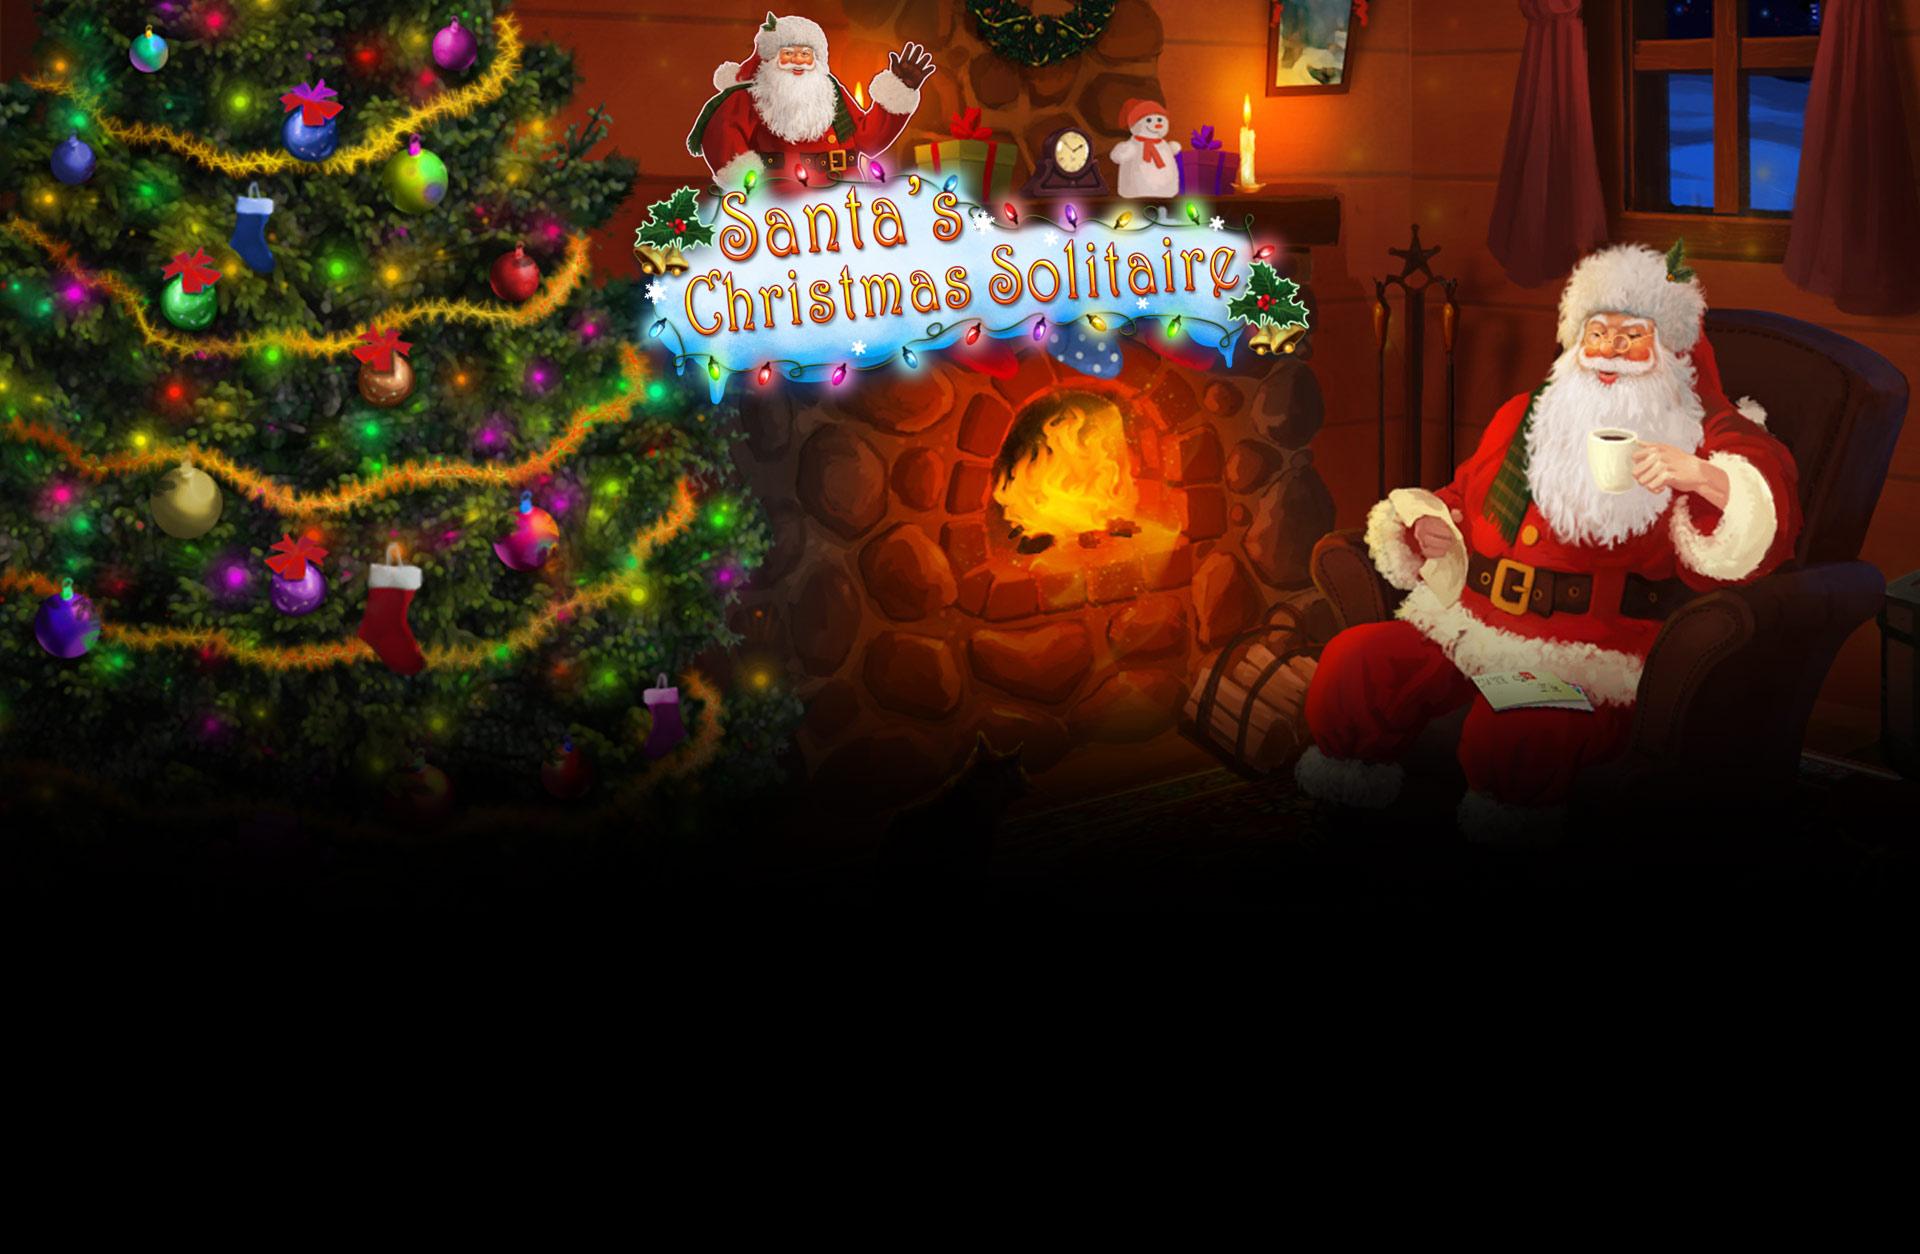 Christmas Solitaire.Santas Christmas Solitaire Gamesload